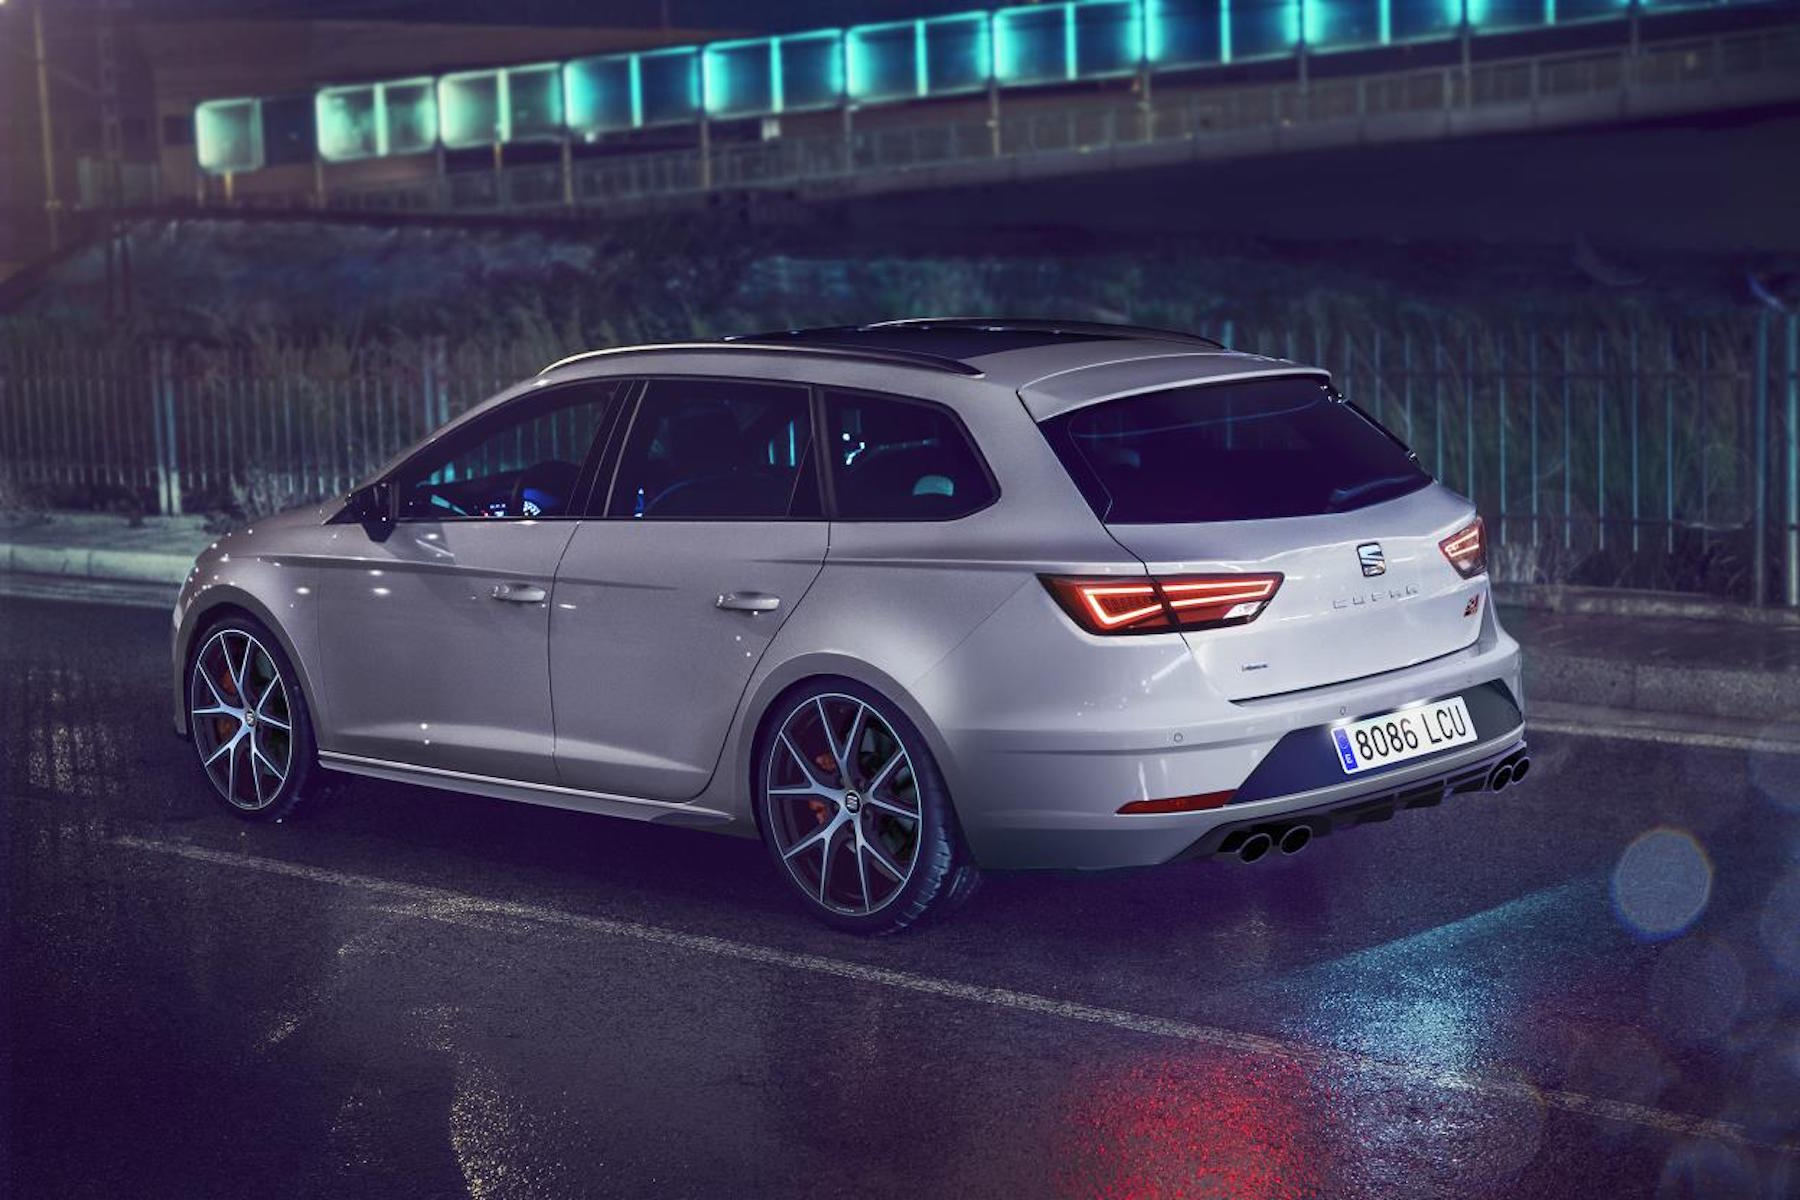 New Seat Leon ST Cupra Carbon Edition